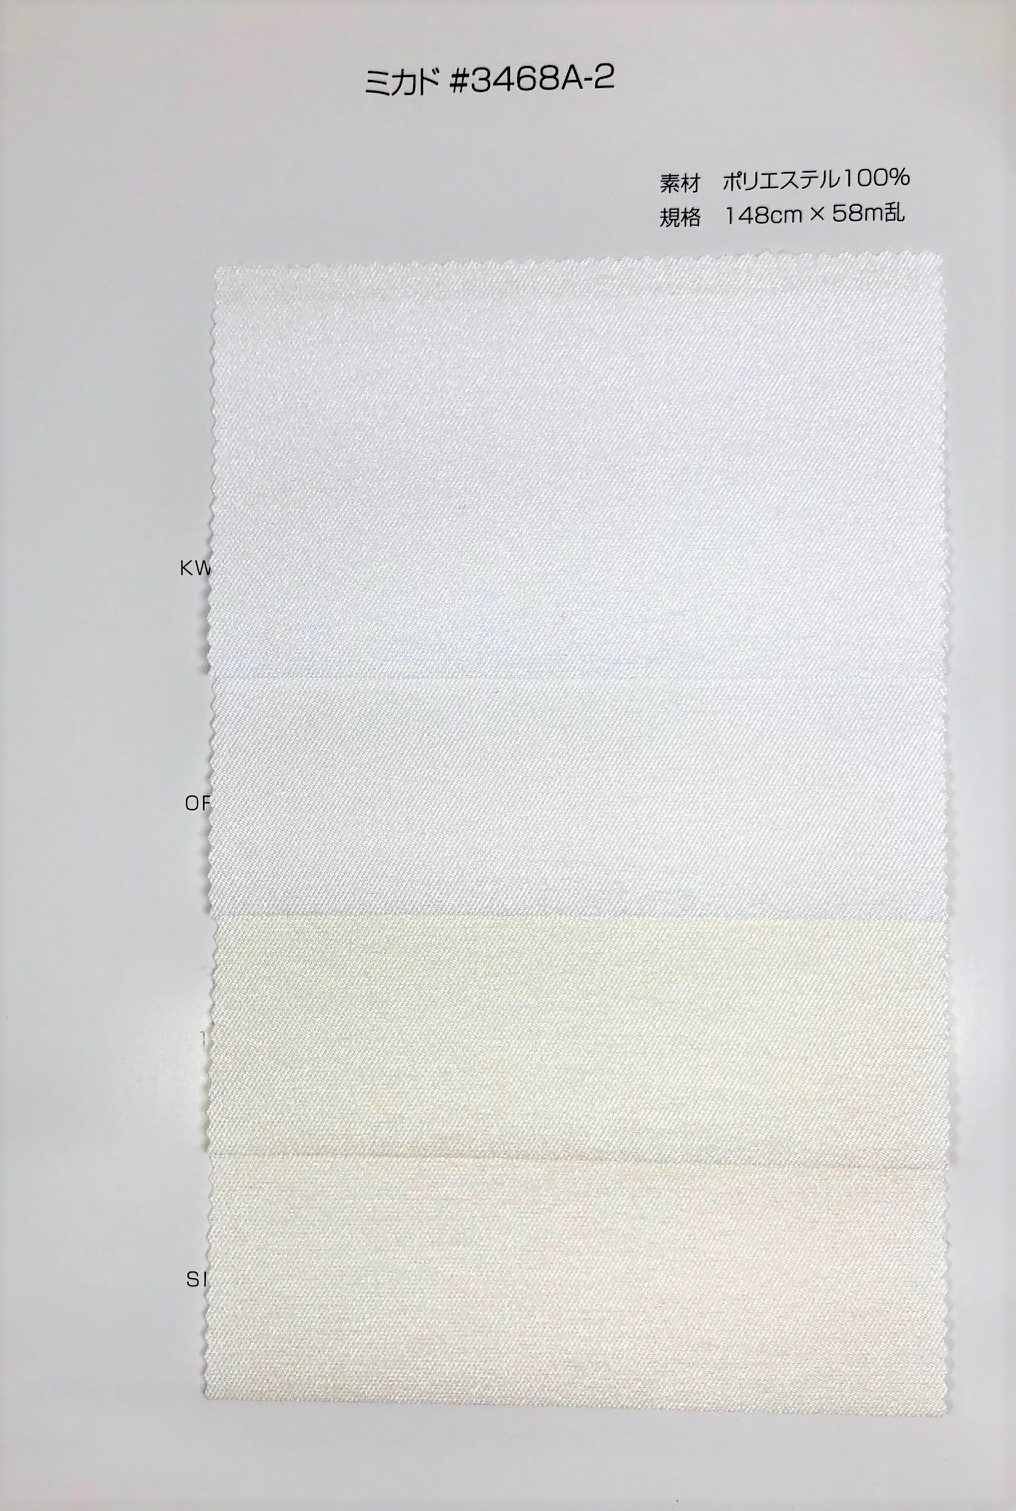 3468A-2 ミカドツイル[生地] サンコロナ小田/オークラ商事 - ApparelX アパレル資材卸通販